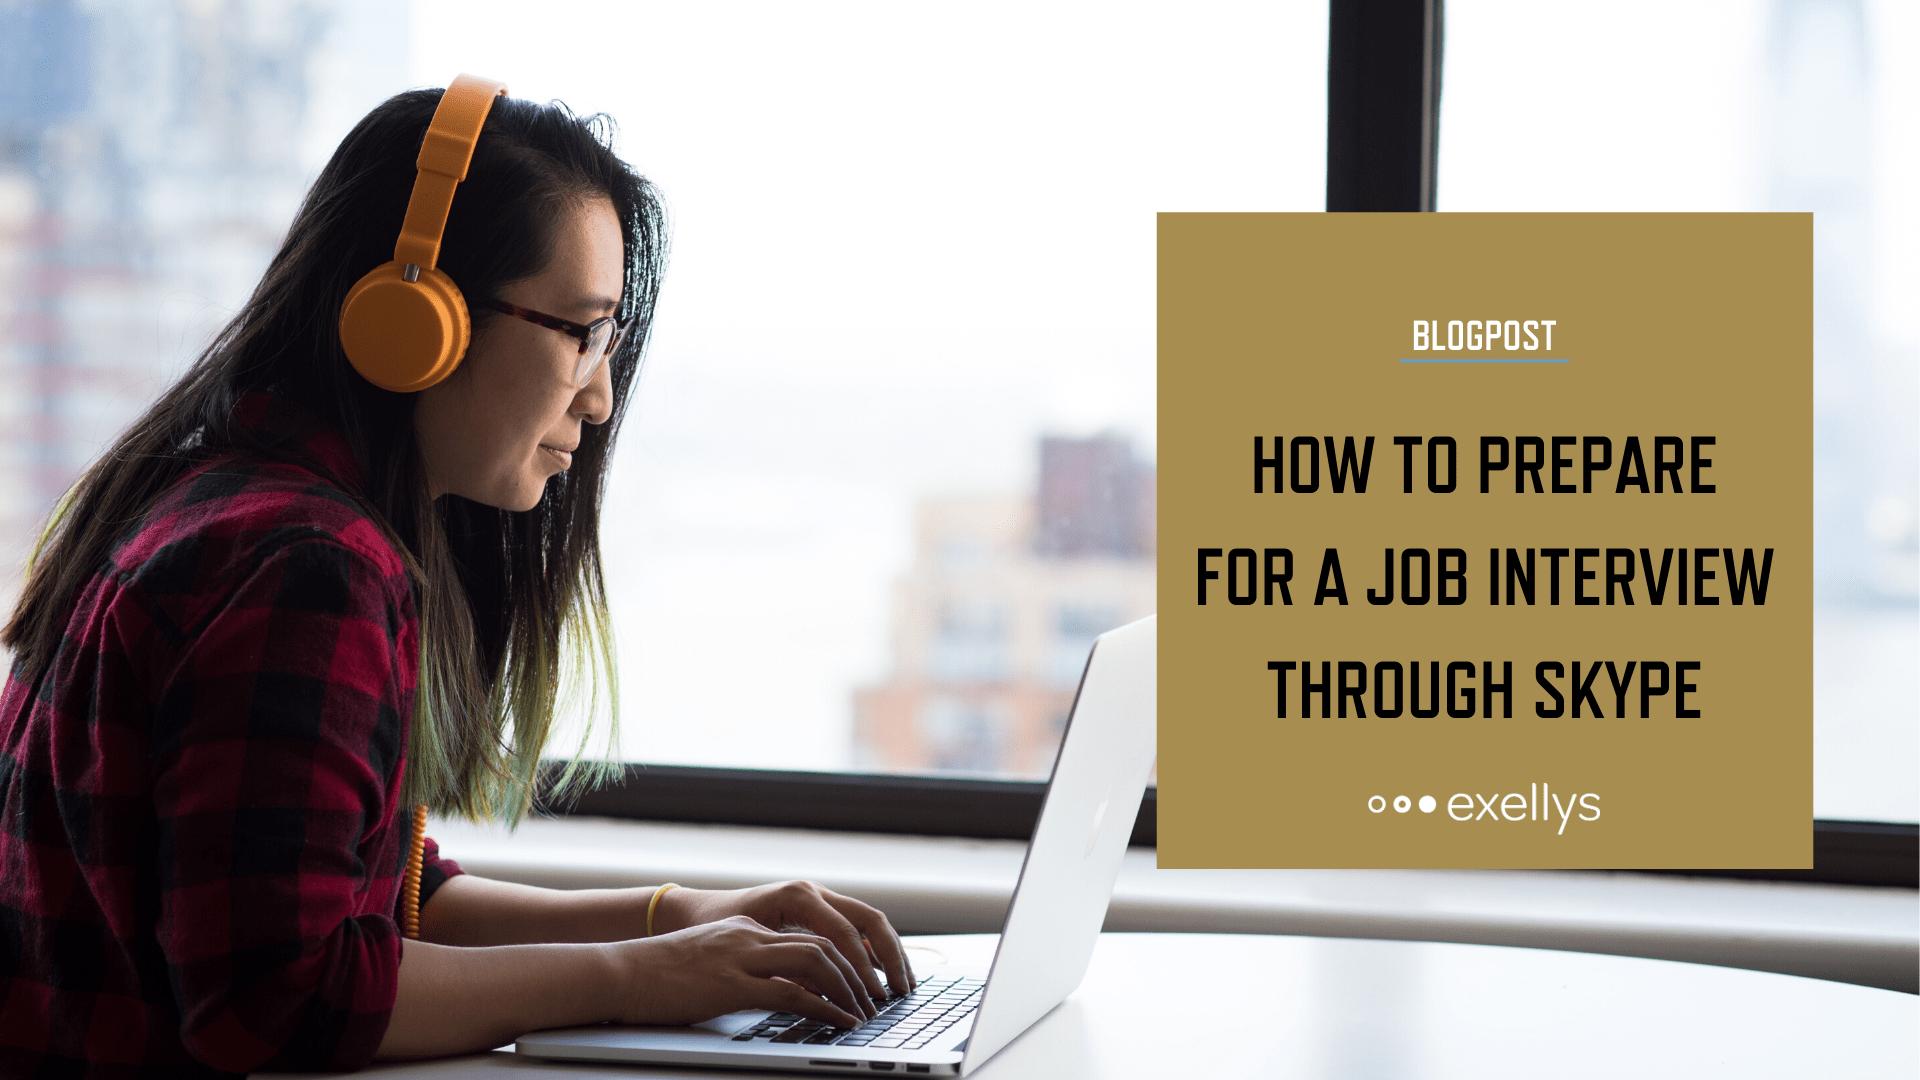 How to prepare for a job interview through Skype - Social share image